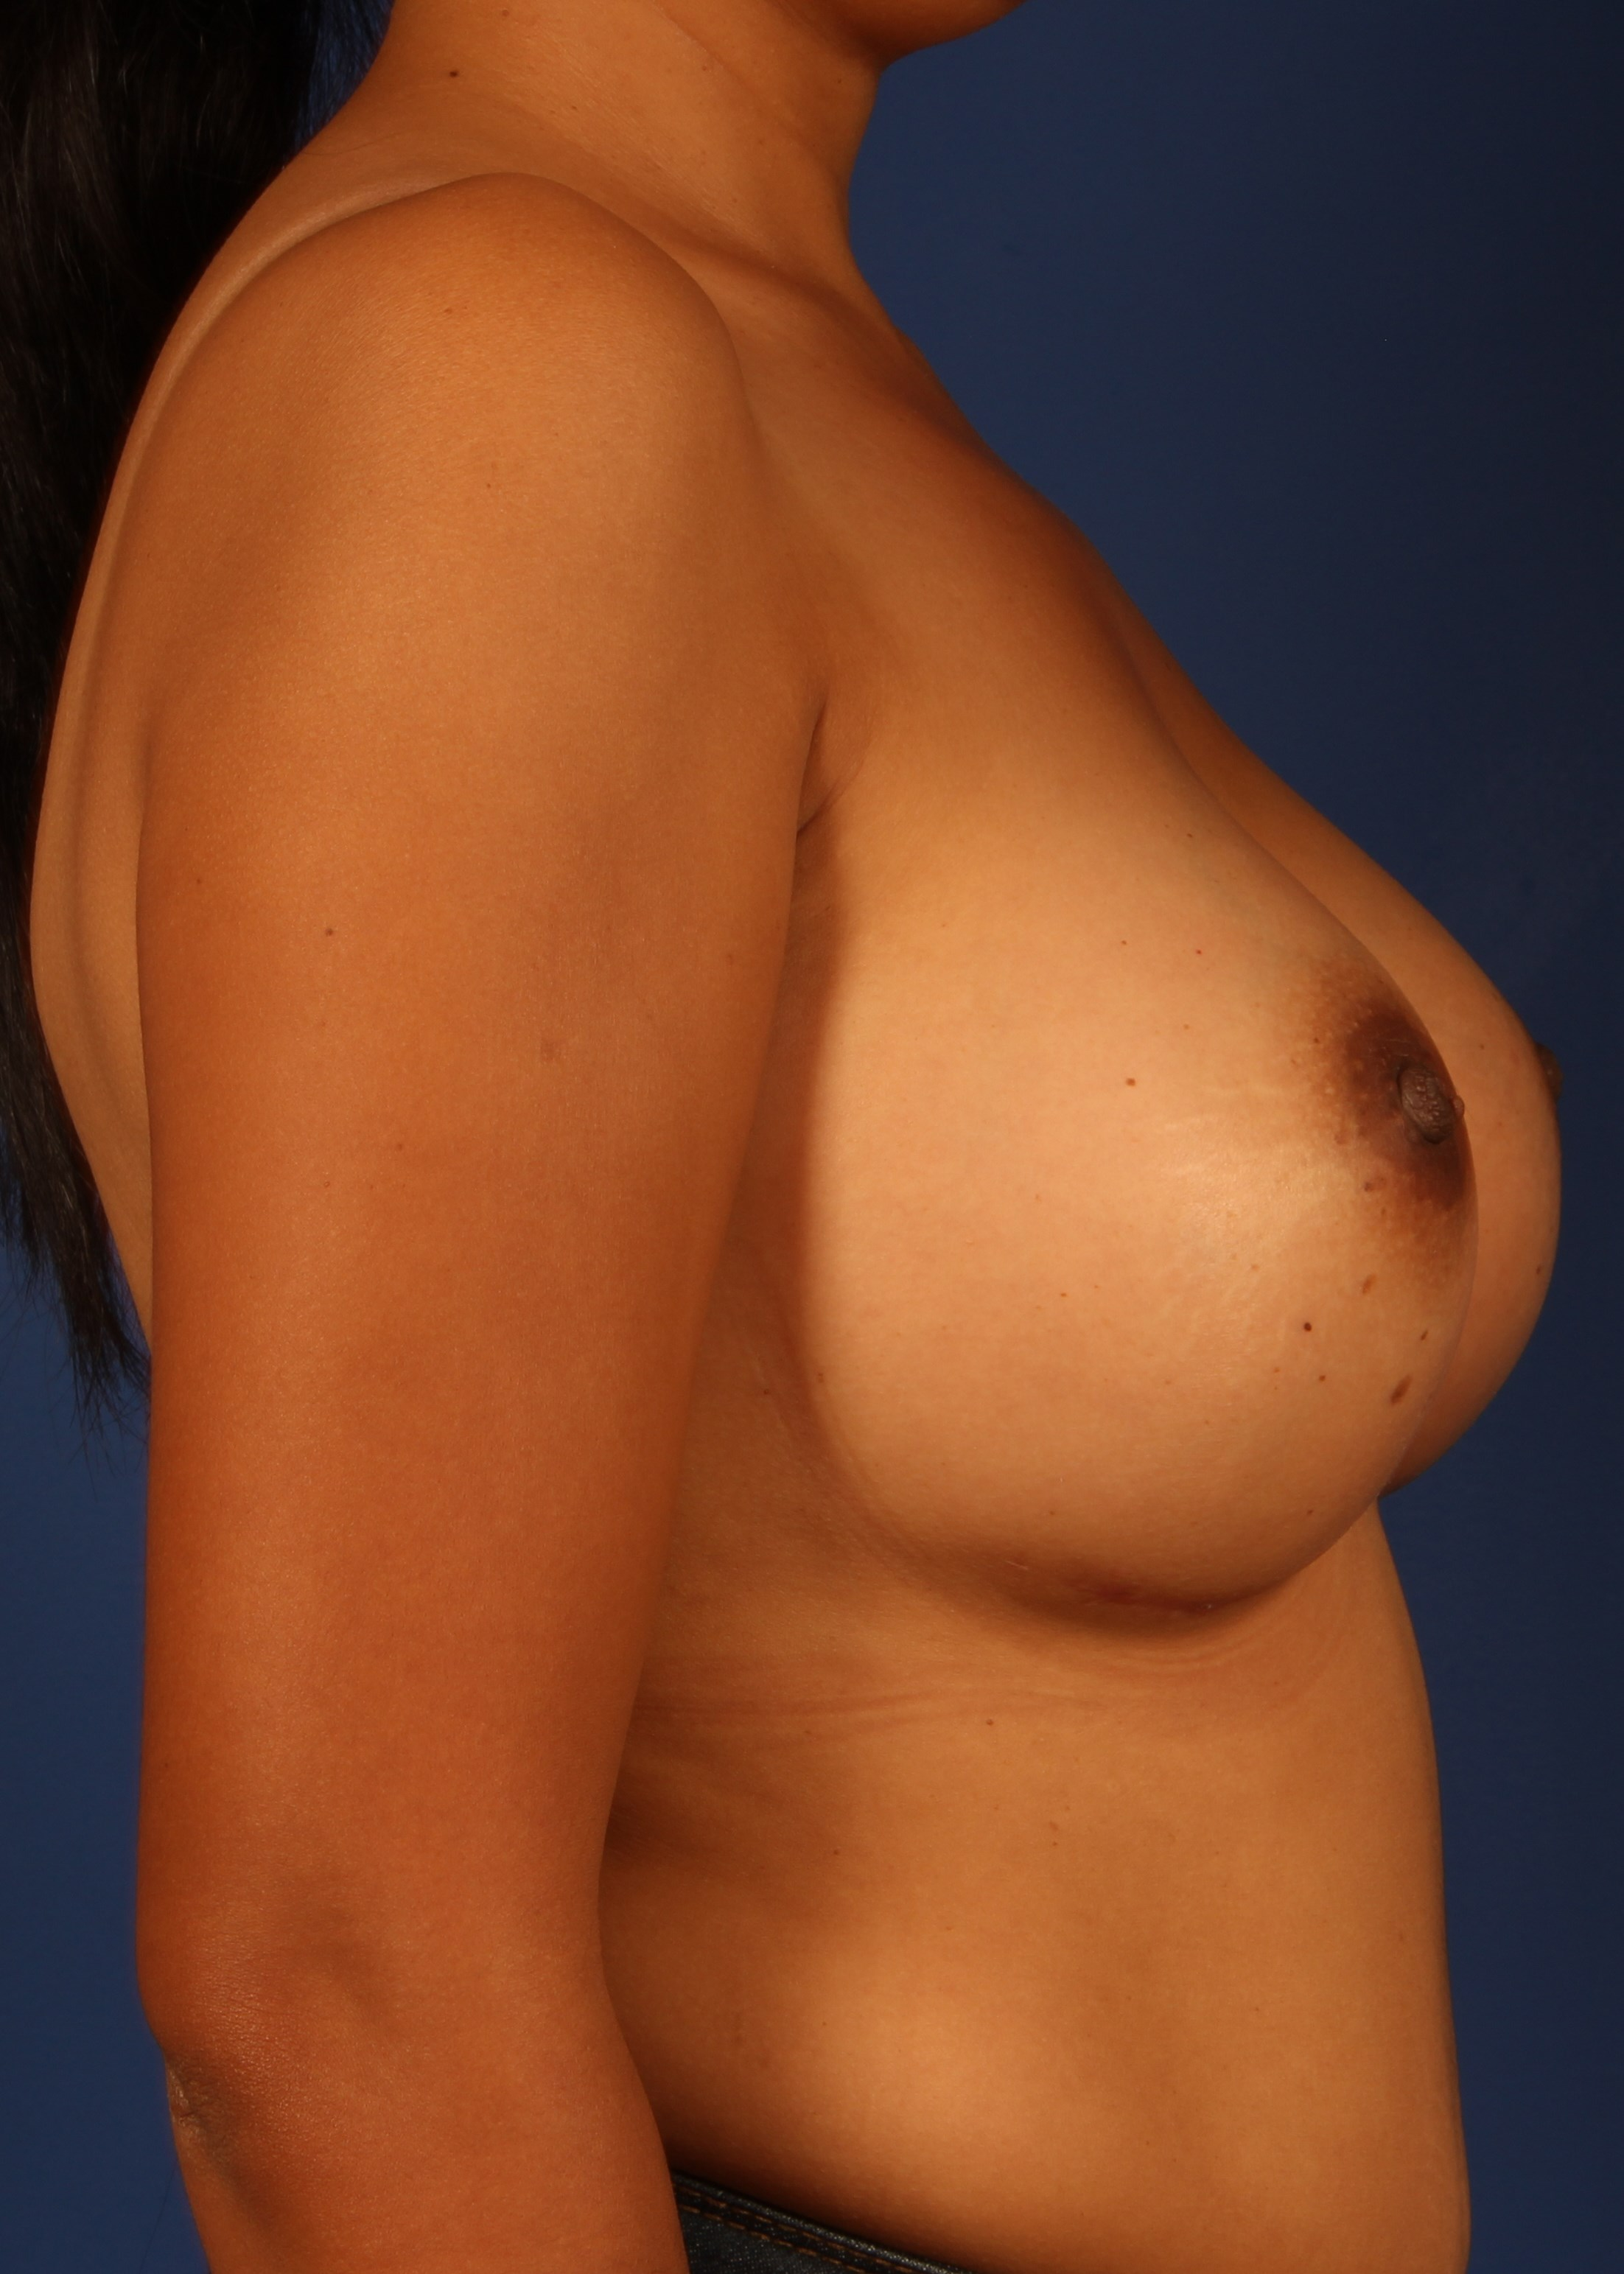 Breast Augmentation After - Dr Mata